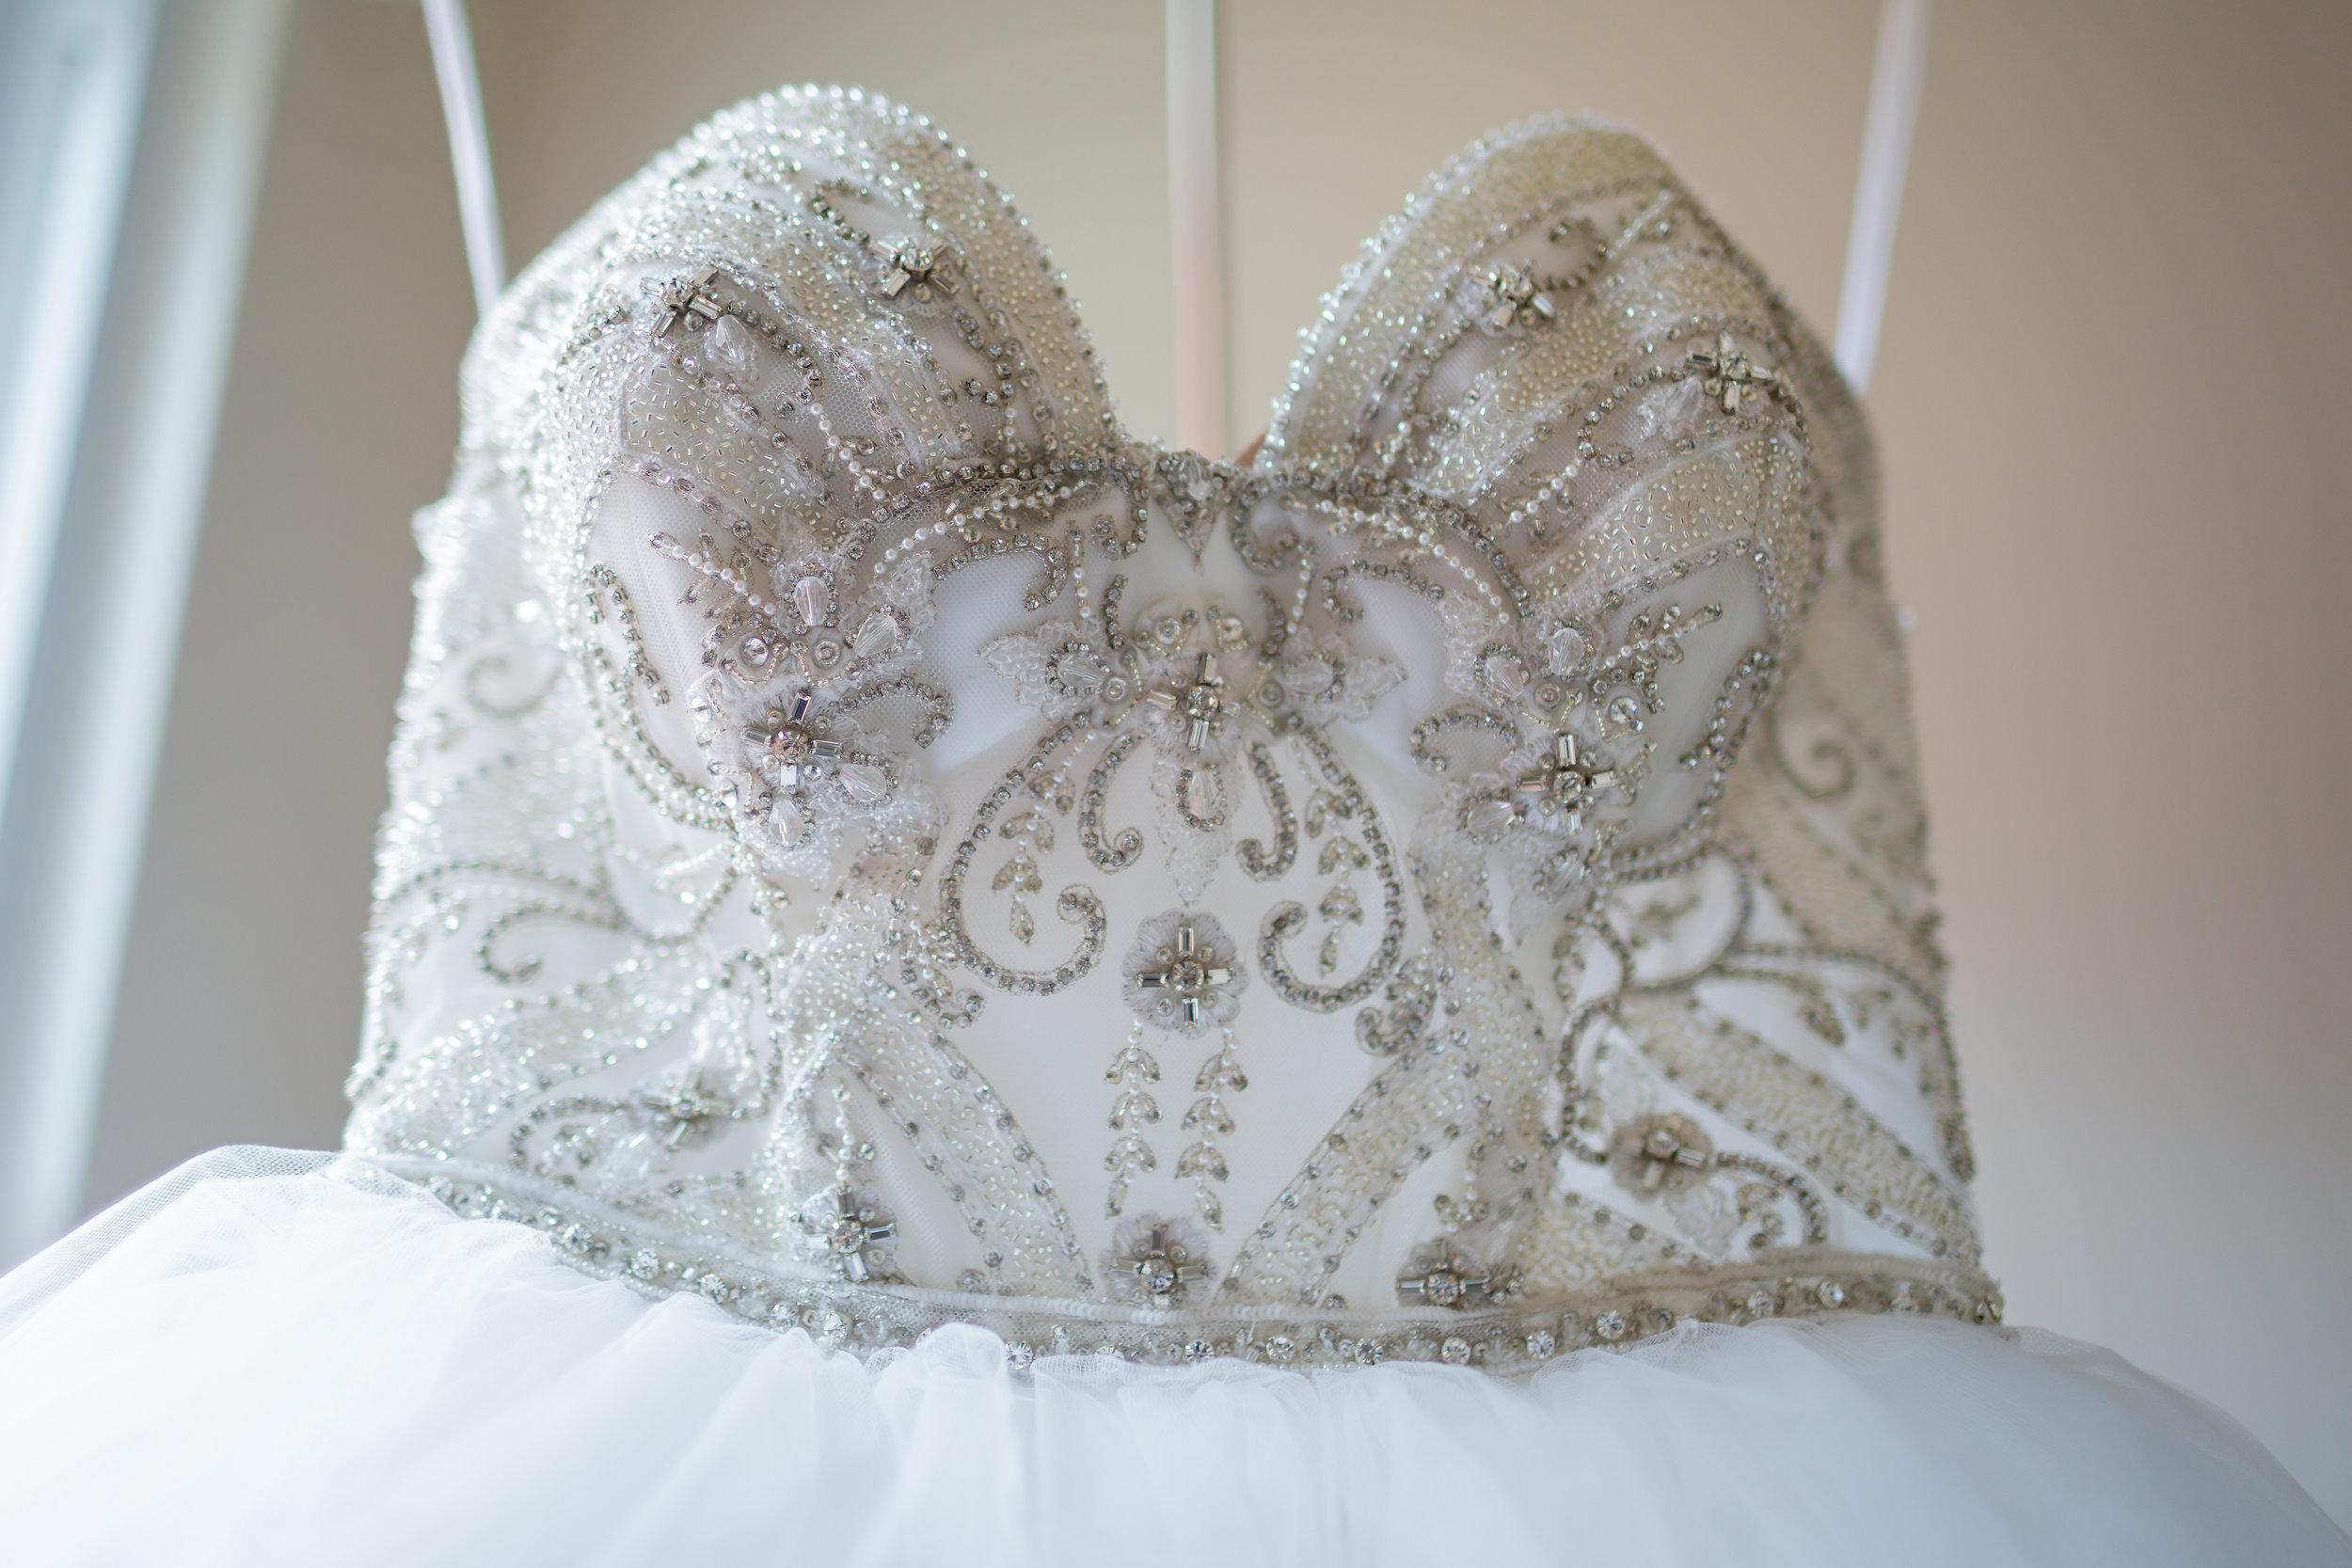 Beaded Wedding Dress - Pittsburgh Wedding Venue - Duquesne University Wedding